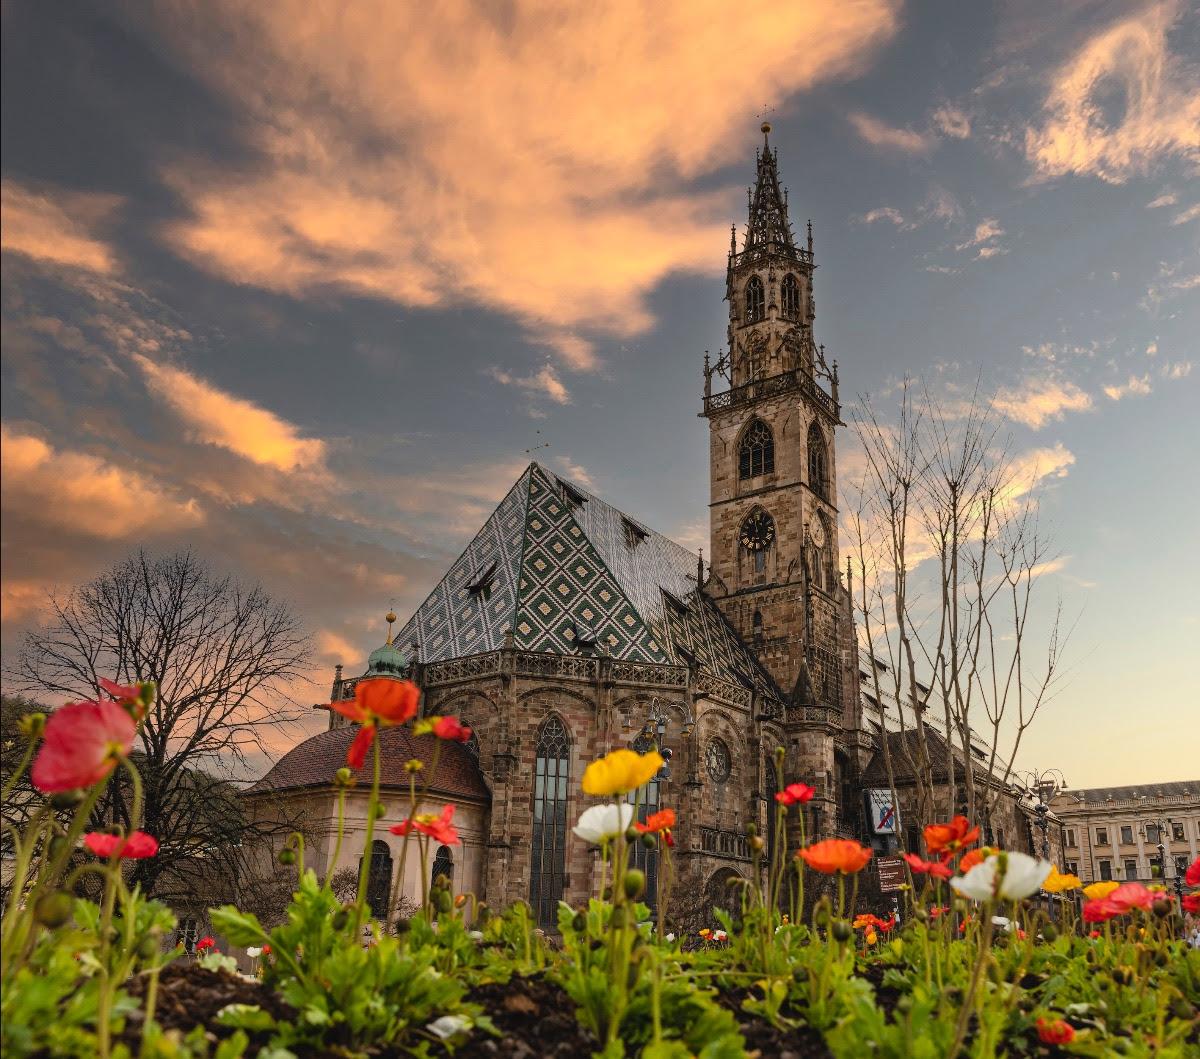 City of Bozen